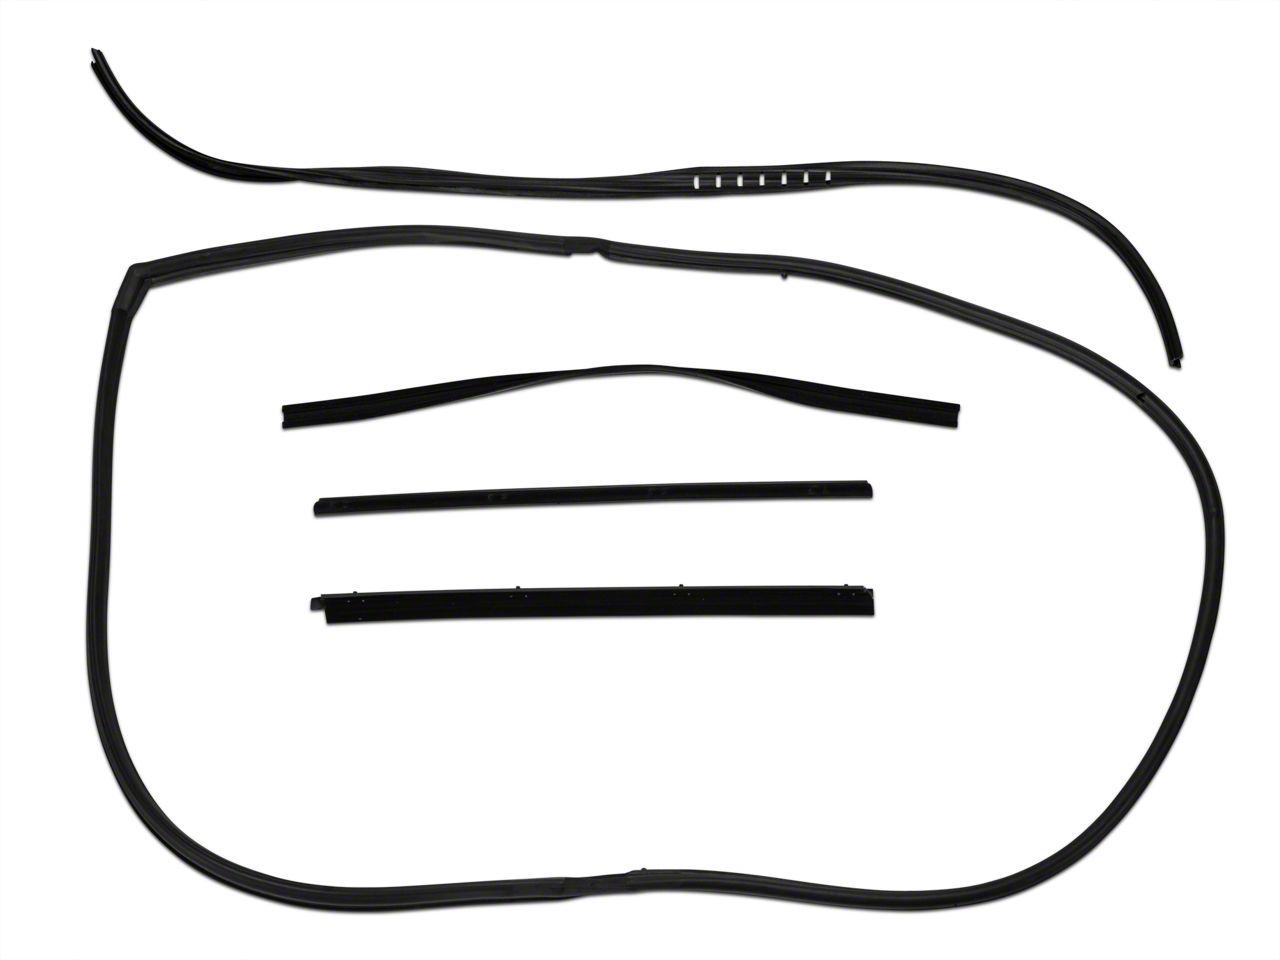 OPR Window Channel Seal Kit Driver Side w/ Movable Vent (87-95 Jeep Wrangler YJ)